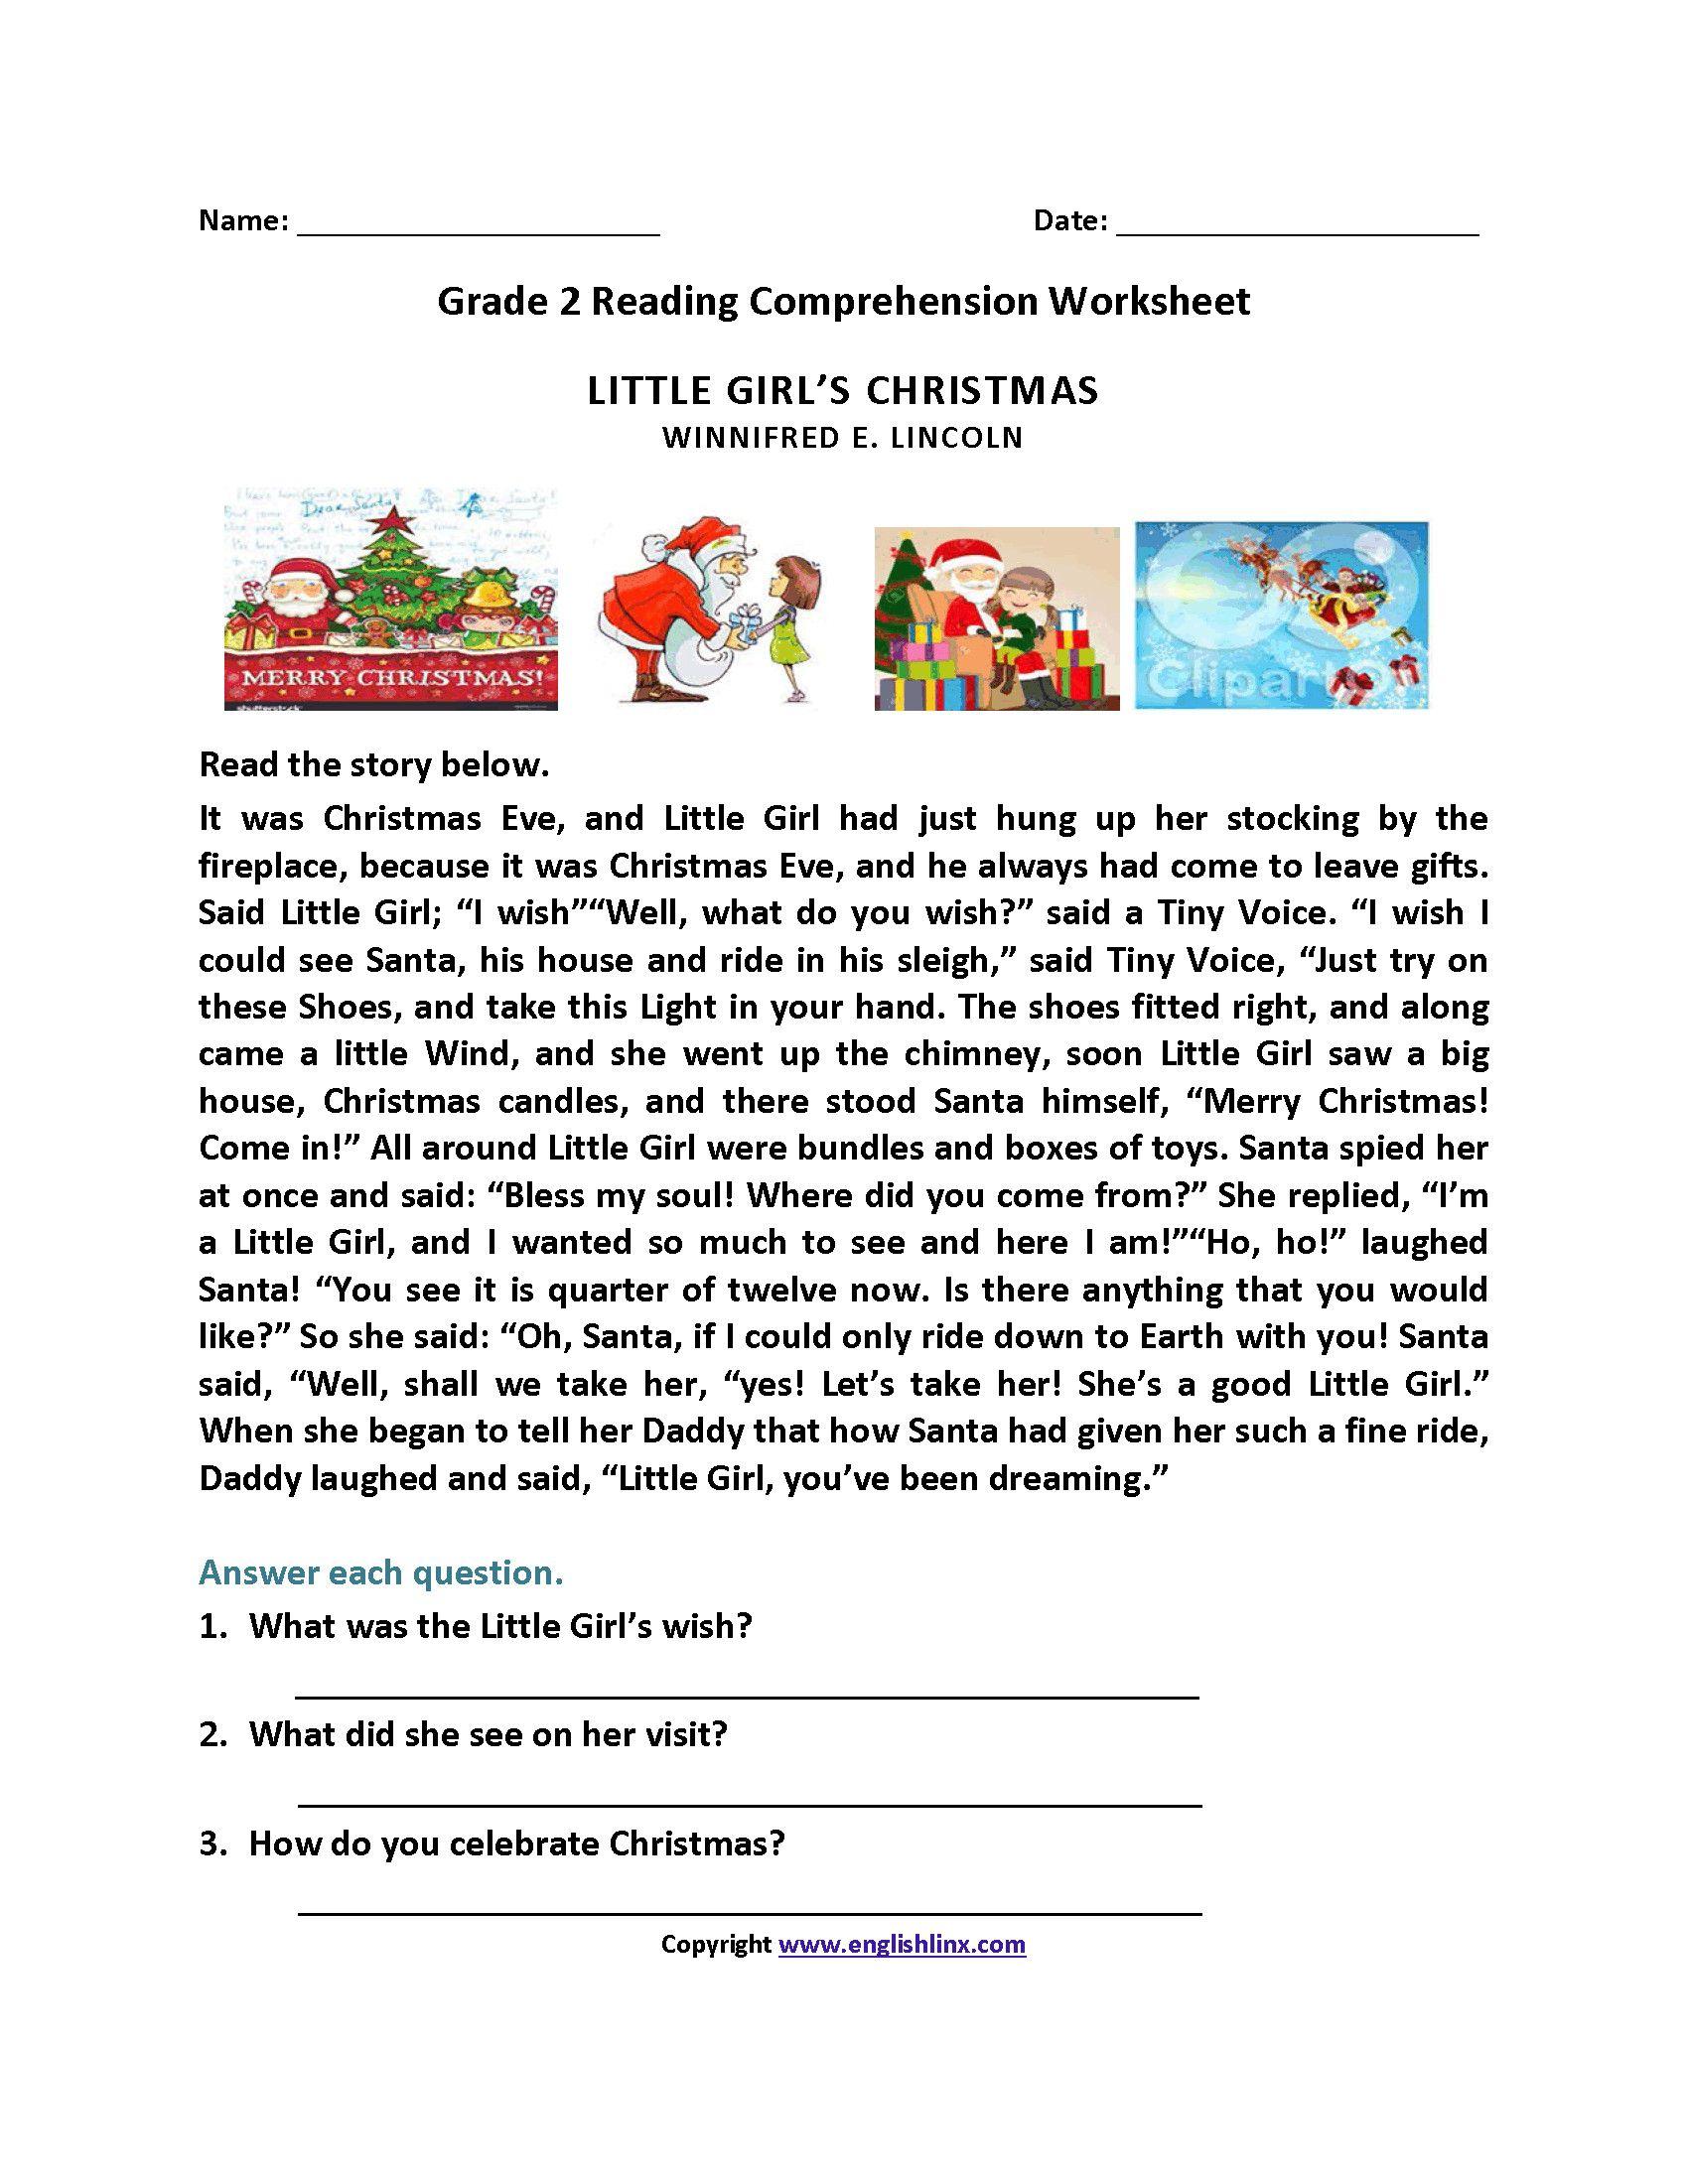 2Nd Grade Reading Comprehension Worksheets In 2020 | Reading